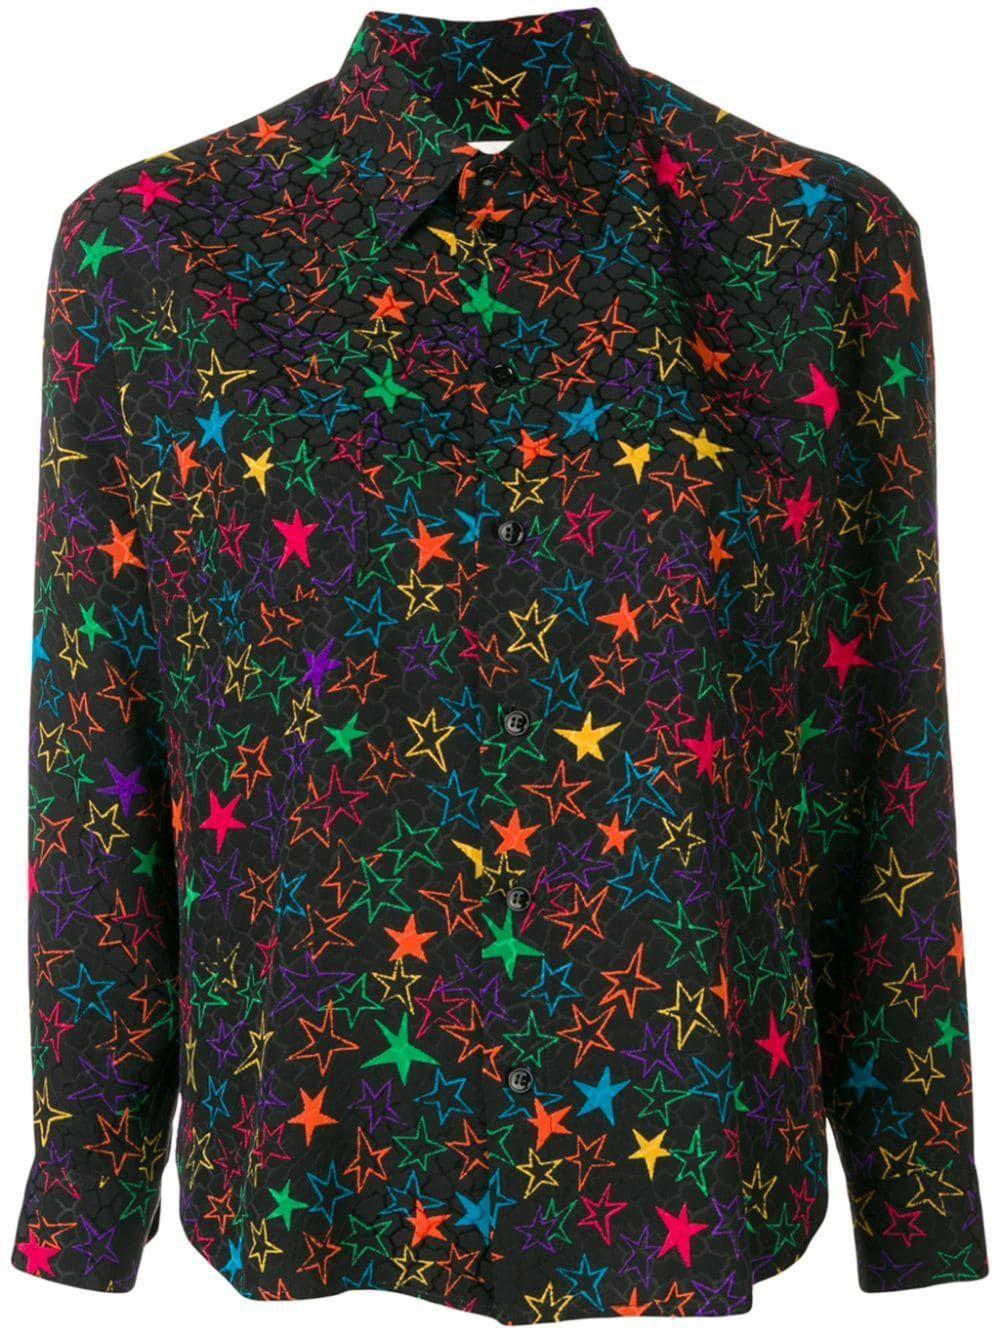 Long Sleeve Neon Star Blouse Item # 551303Y318V